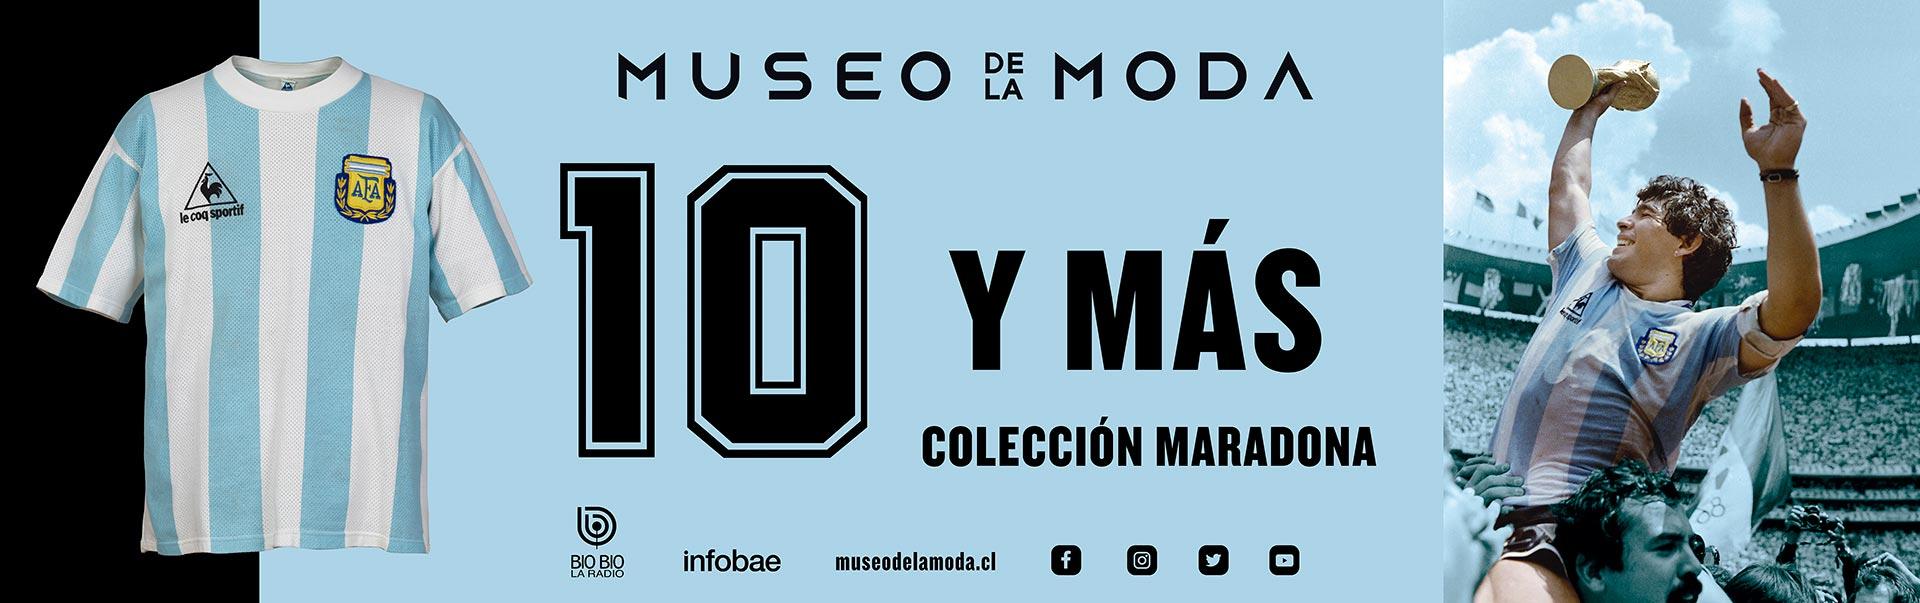 Maradona Gallery